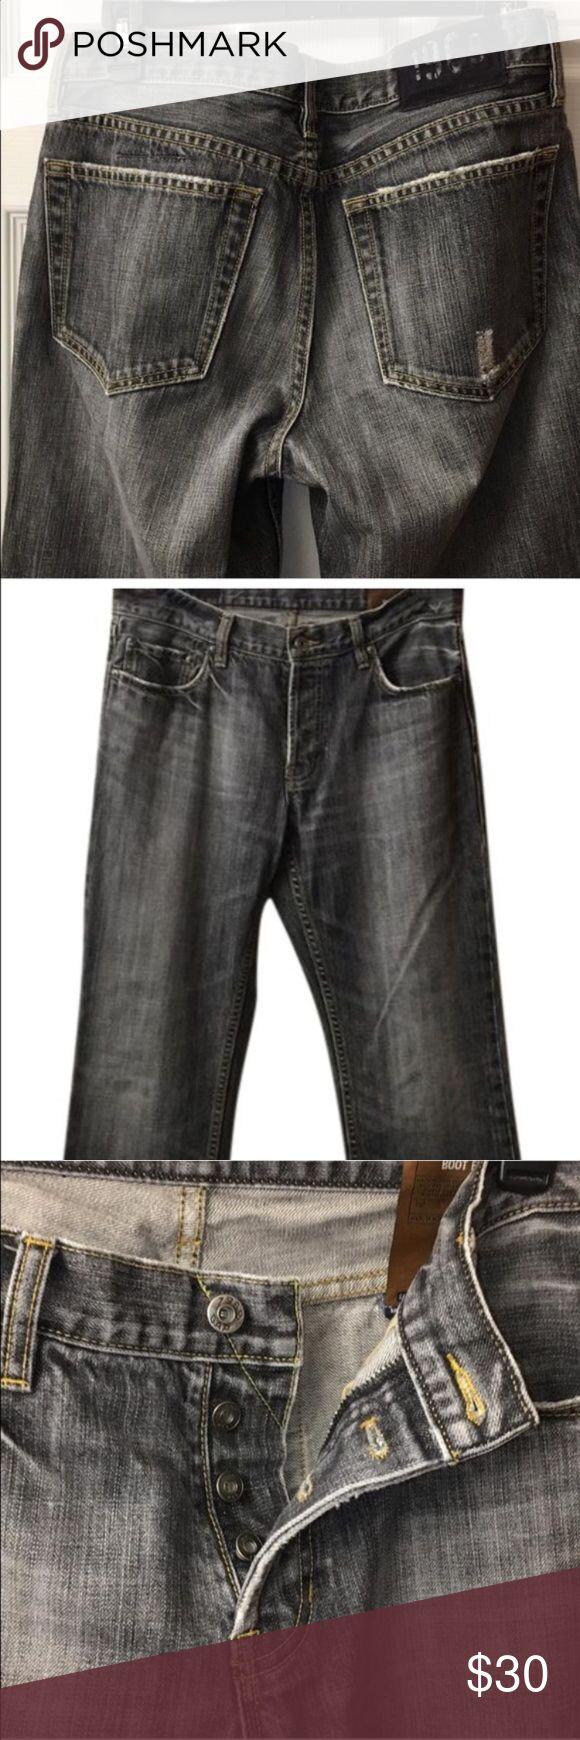 Vintage GAP button fly jeans Vintage button fly gap jeans. Size 32x34.  Broken in sandblasted denim color. GAP Jeans Bootcut